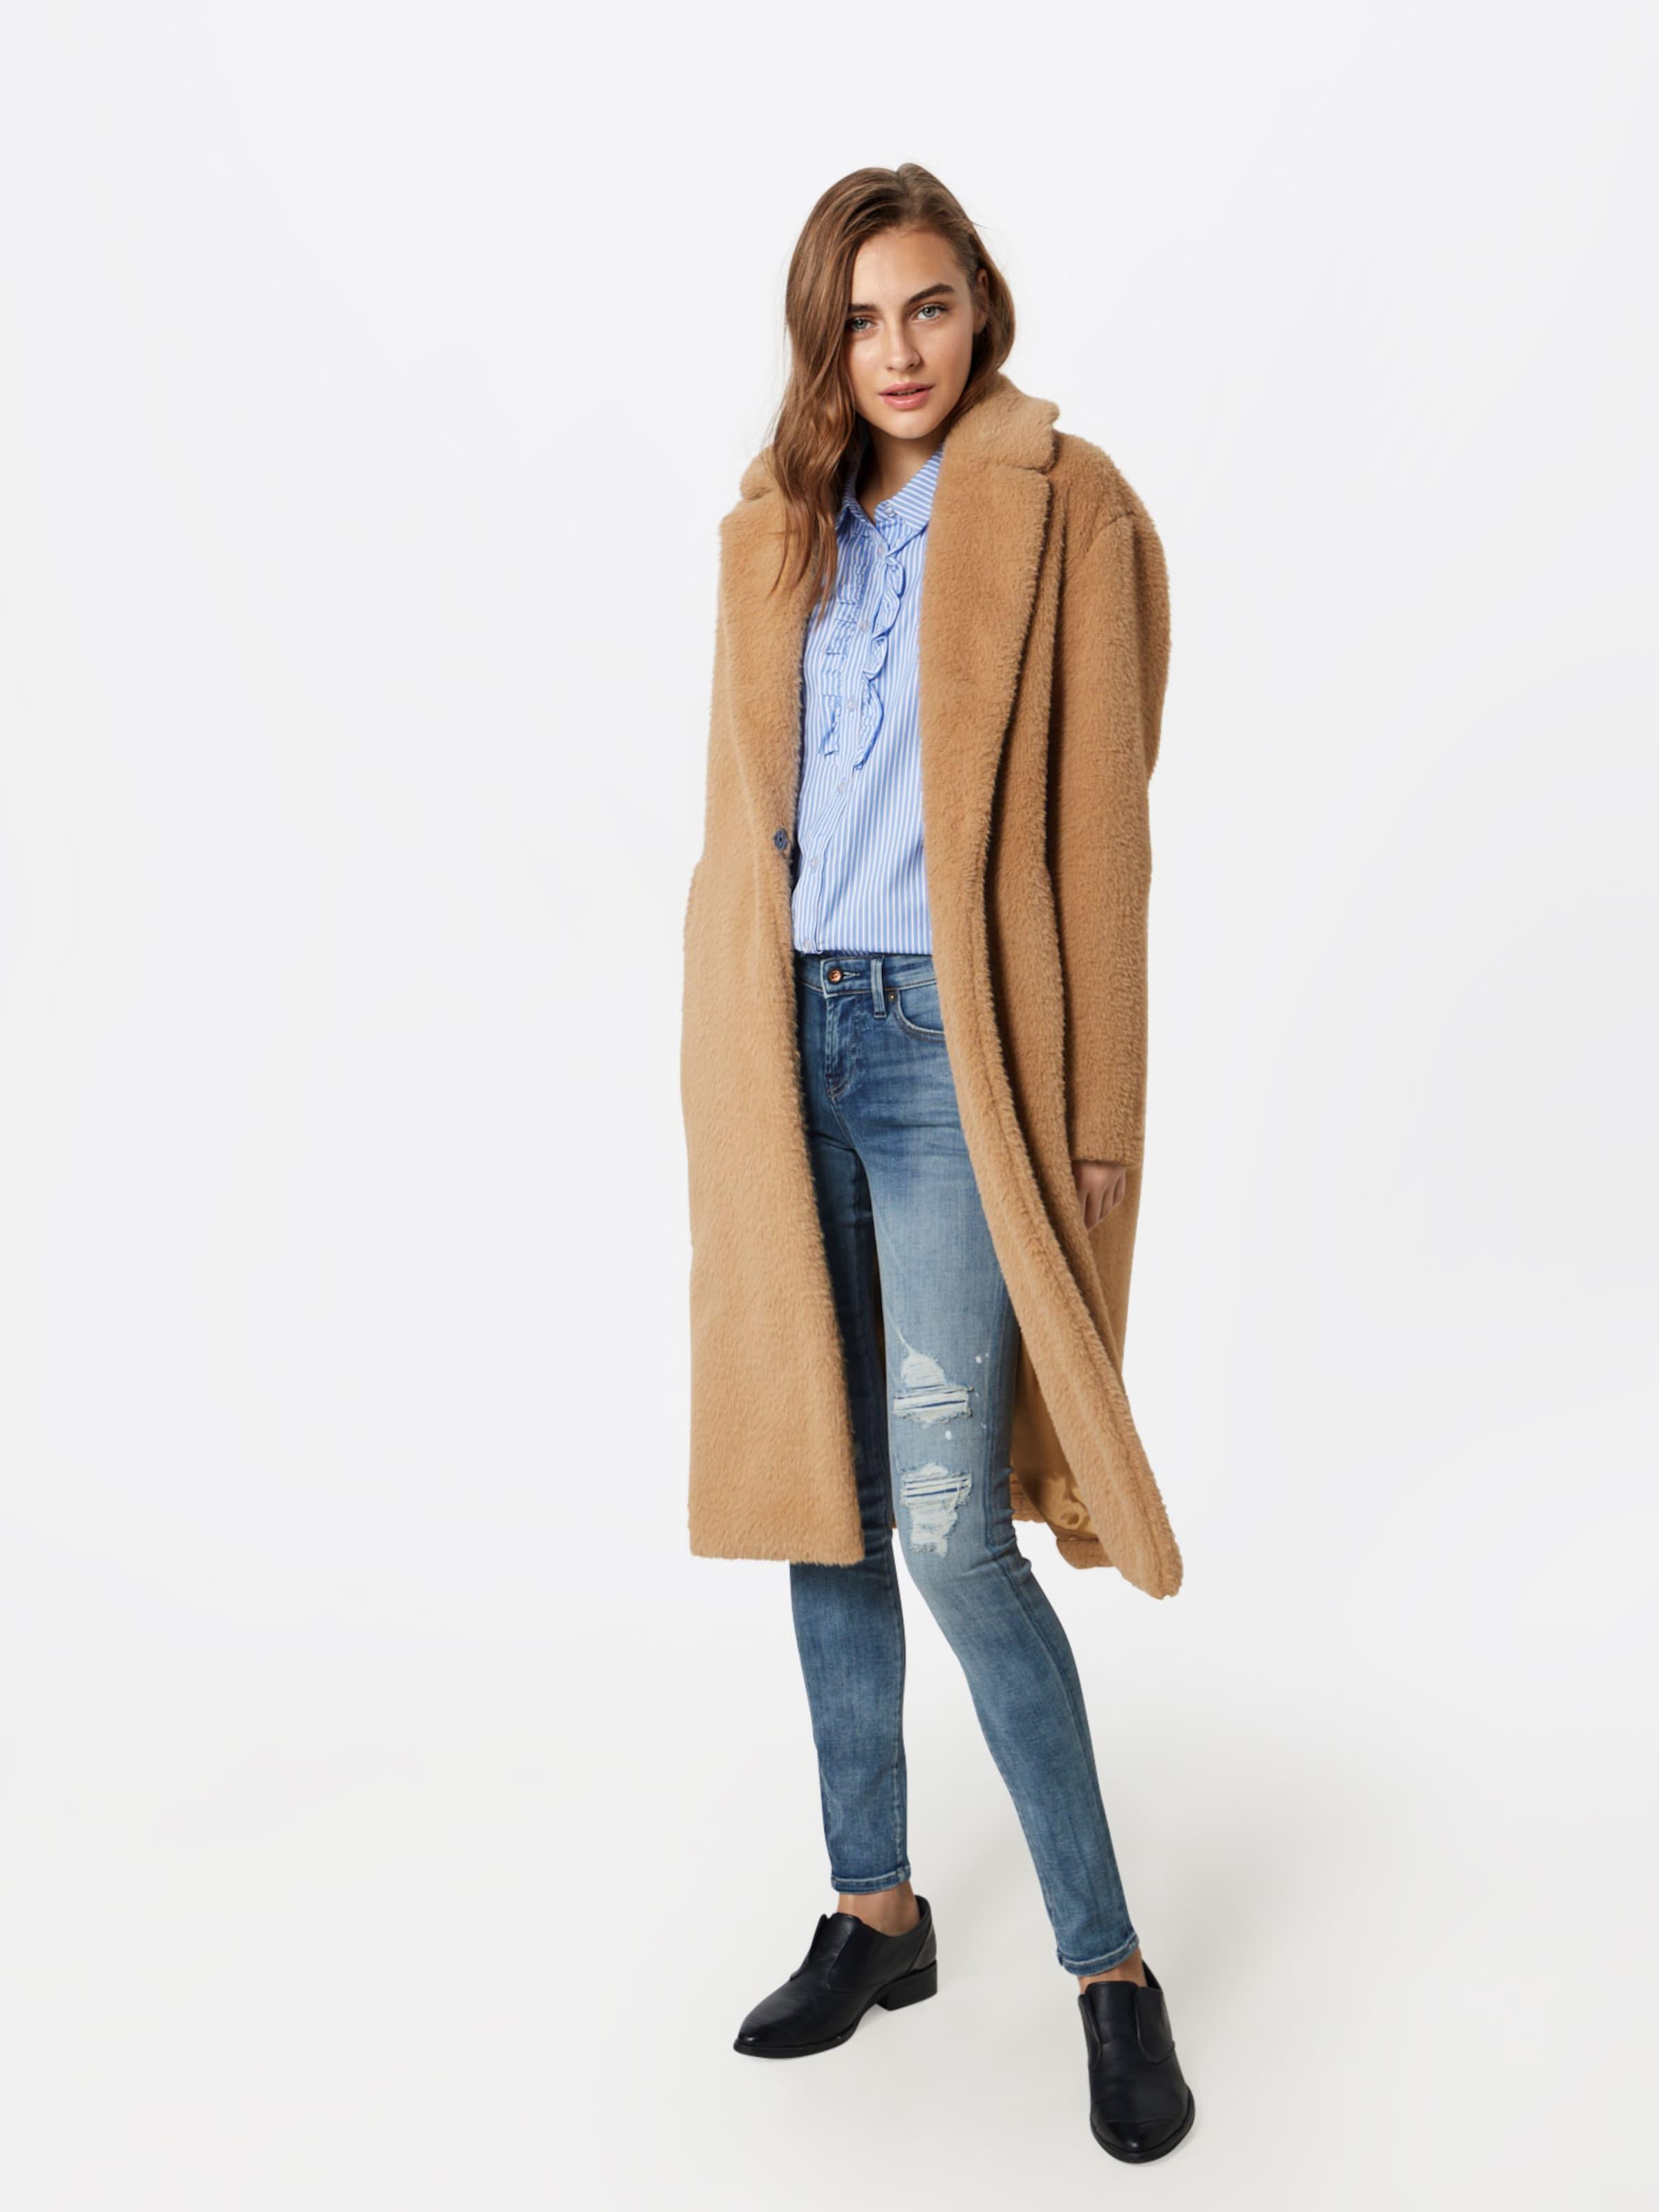 Denham Blue 'sharp' In Jeans Denim jUpqSLzMVG